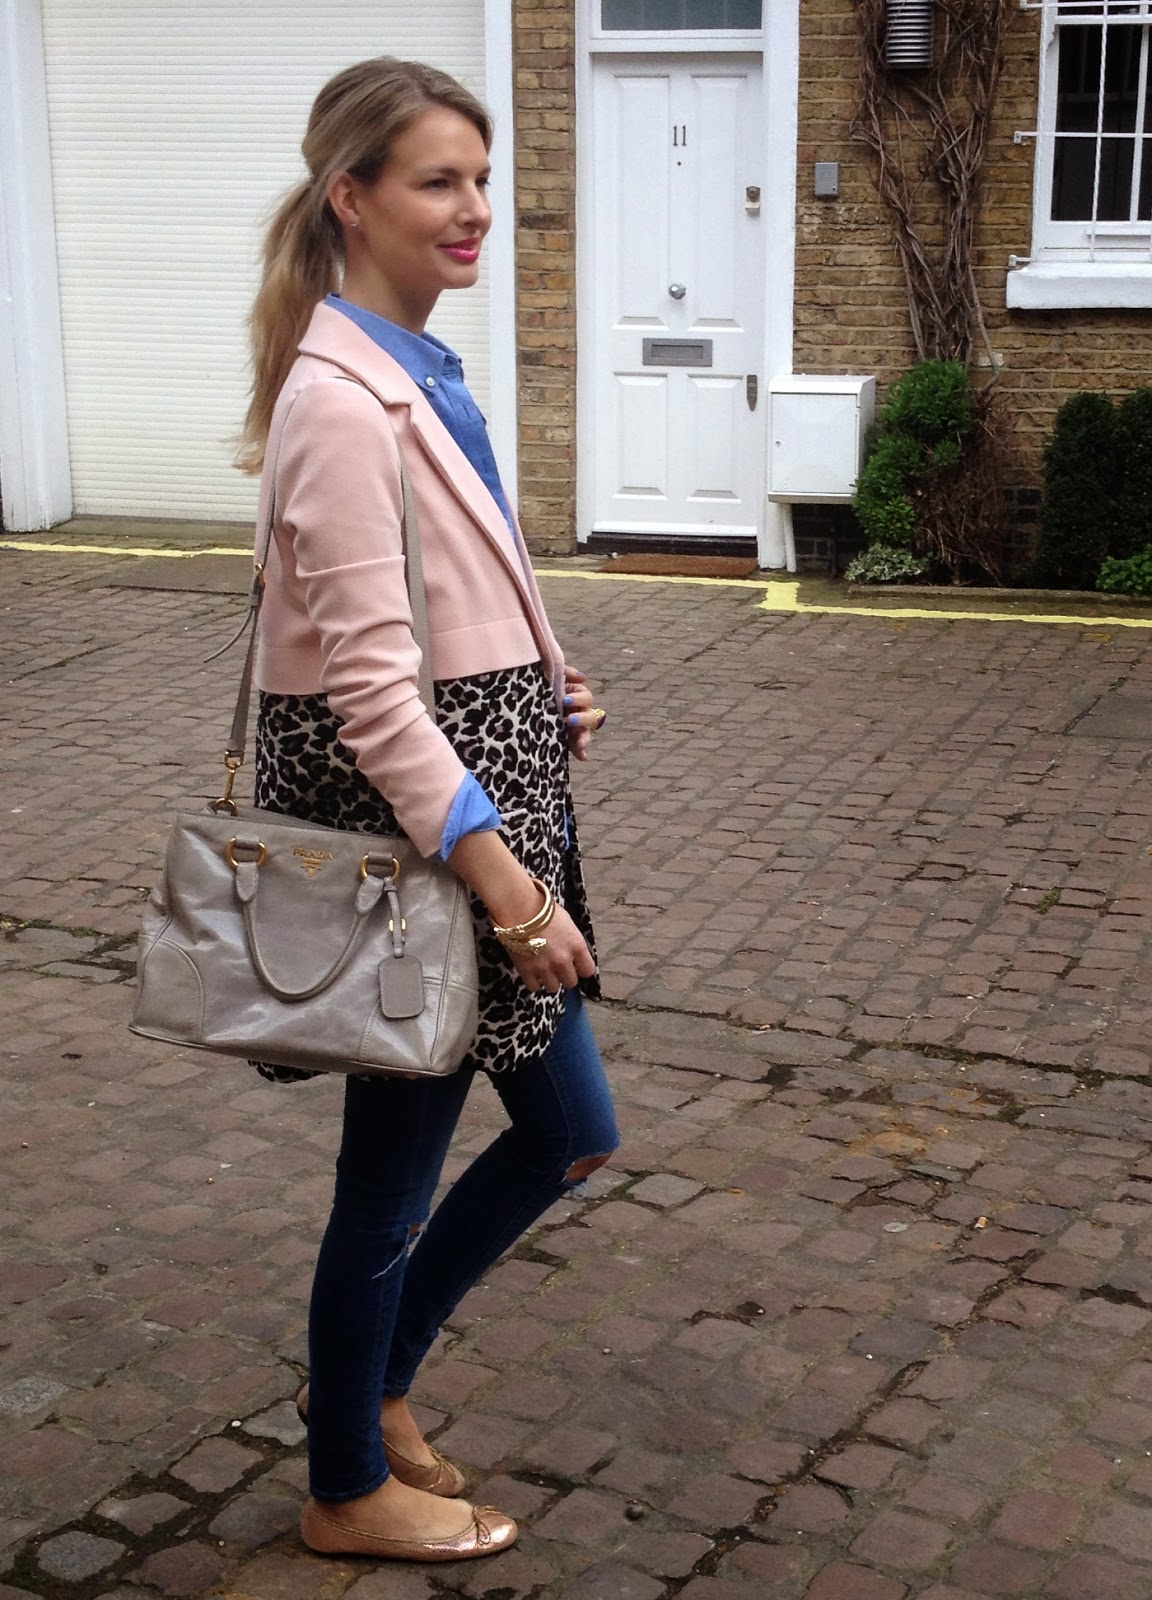 leopard print coat, two-toned coat, pink coat, pink leopard print coat, pastel colour cout, patel pink coat, ripped jeans, asos jeans, street style, chrissabella blogger, prada, prada handbag, anna dello russo bracelet